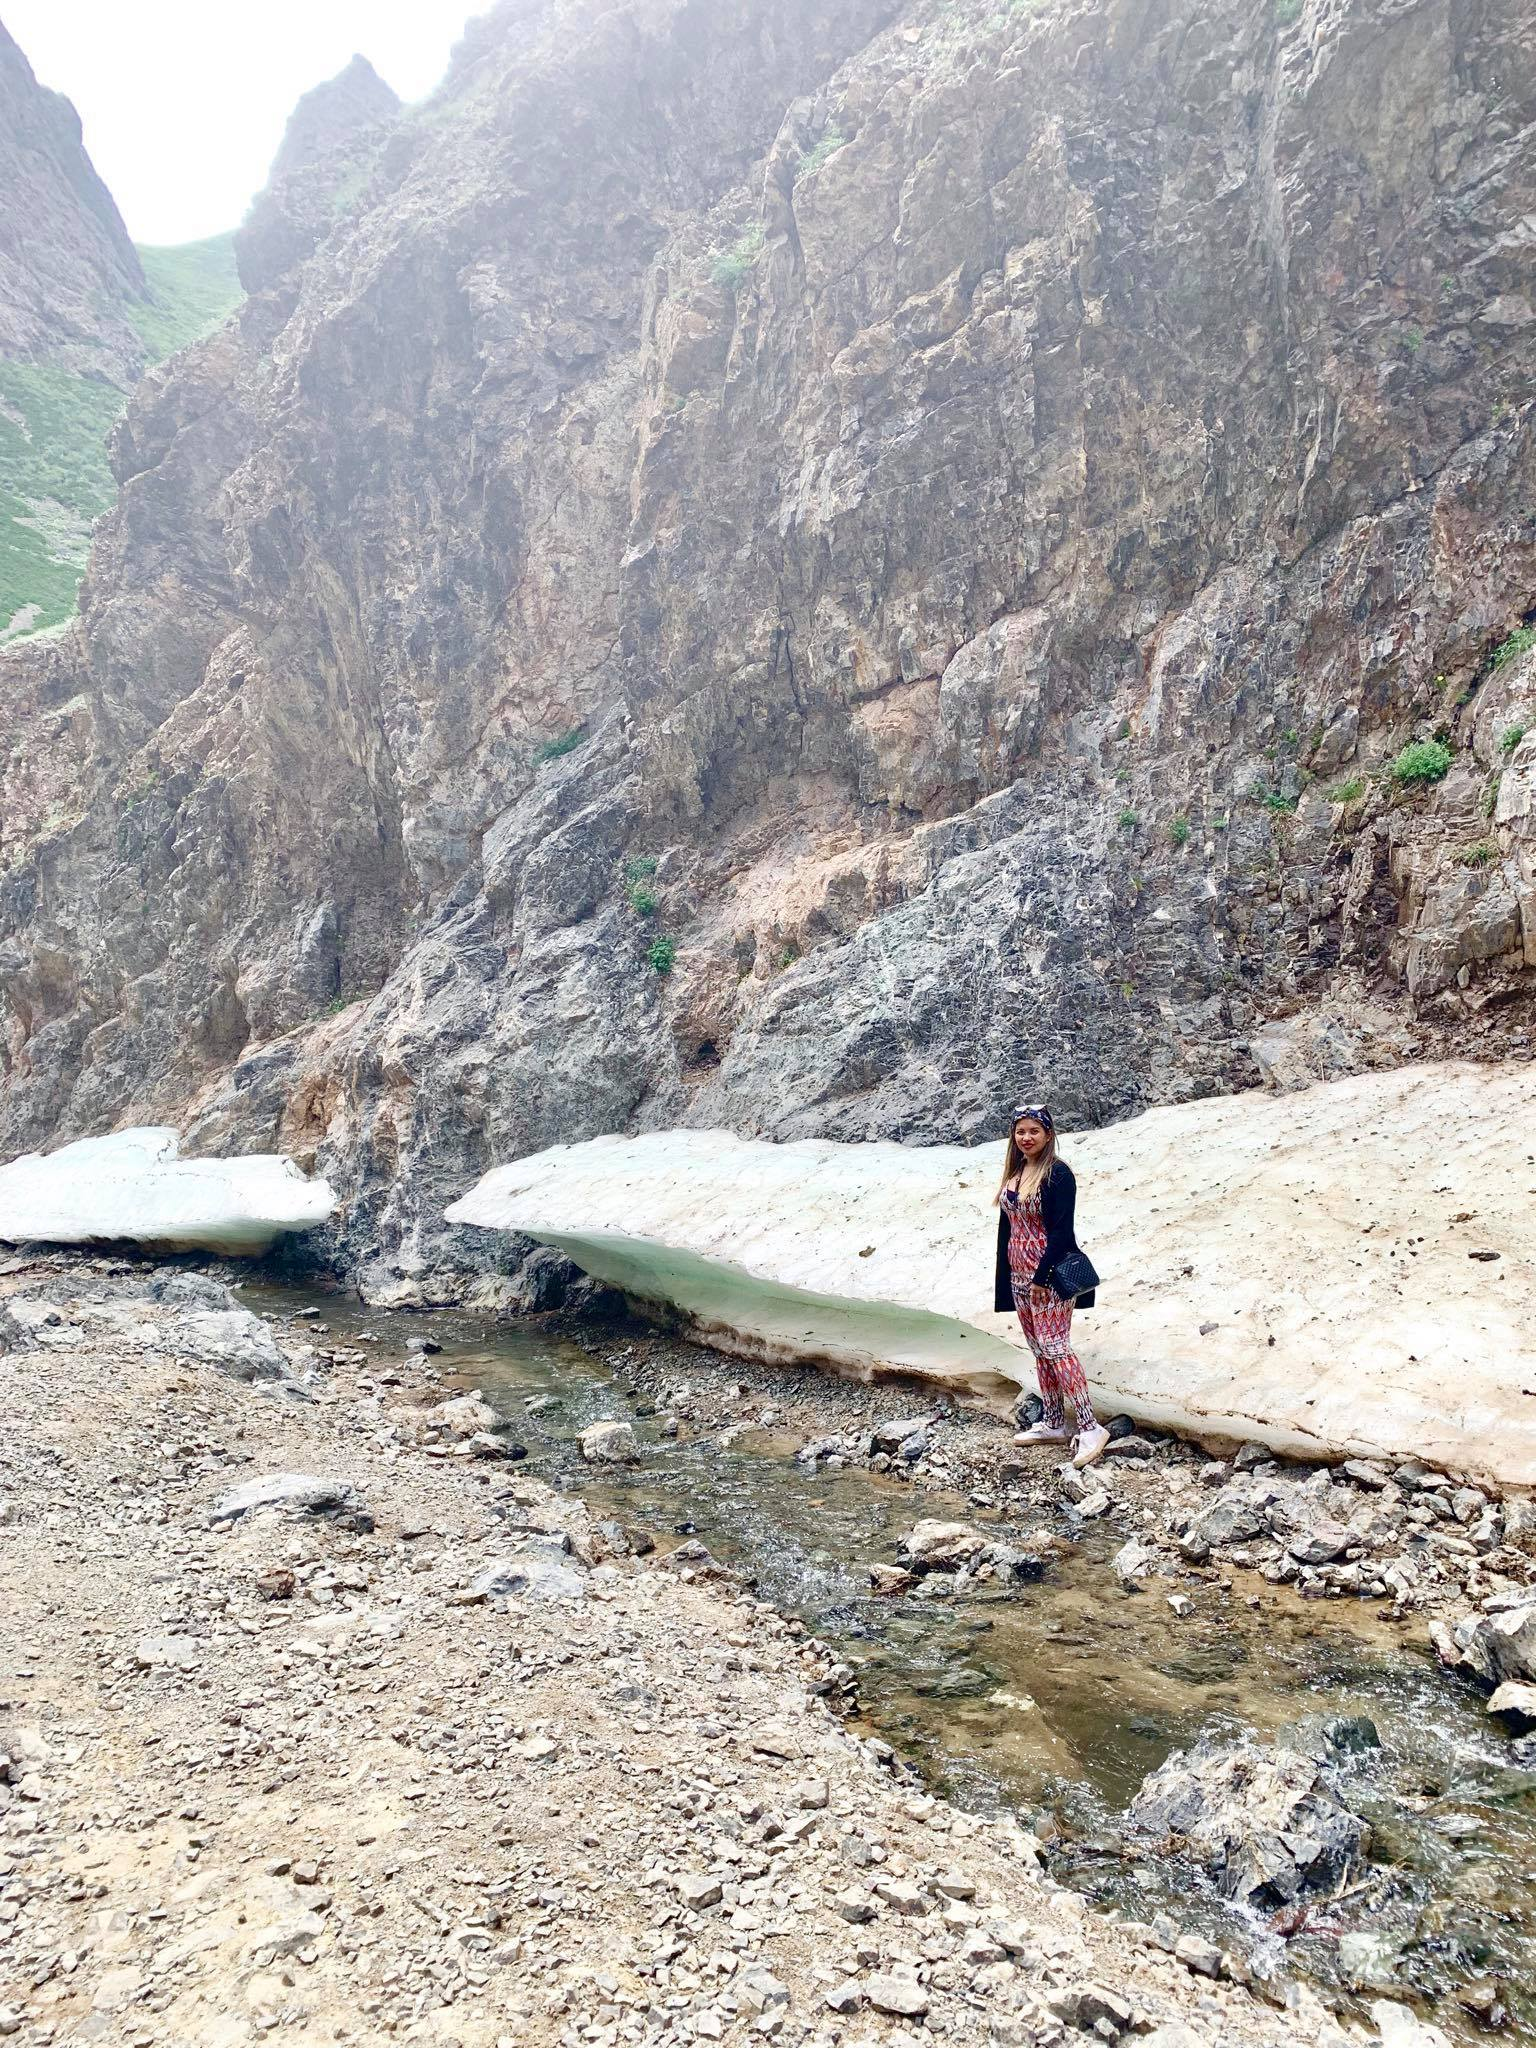 Kach Solo Travels in 2019 Horseback riding trip to the Gobi Gurvan Saikhan National Park25.jpg